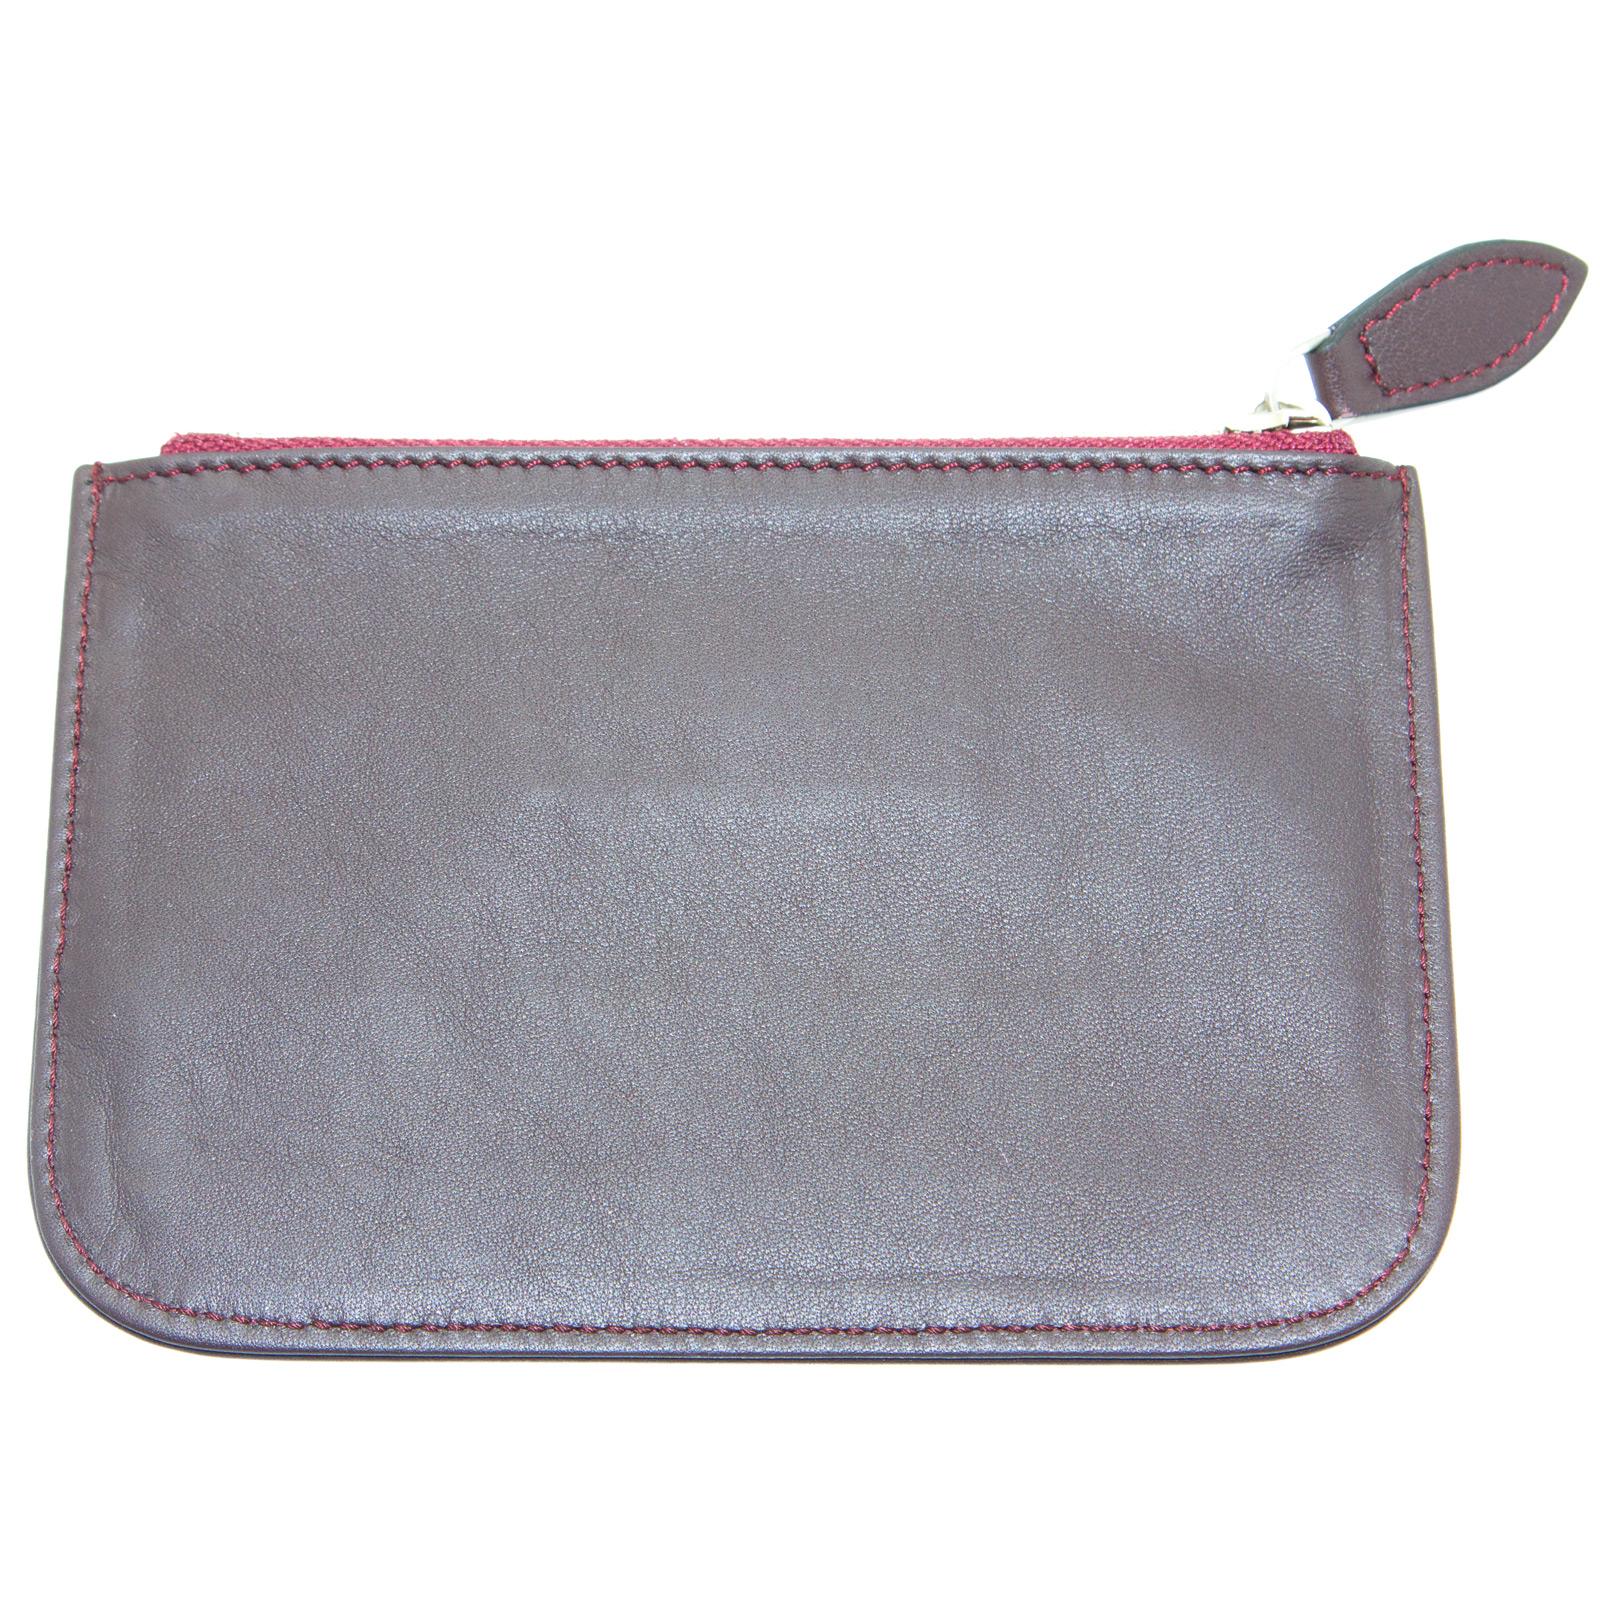 EMPORIO-ARMANI-Women-039-s-034-2012-034-Zip-Top-Coin-Purse-Wallet-YEMG99-195-NWT thumbnail 12